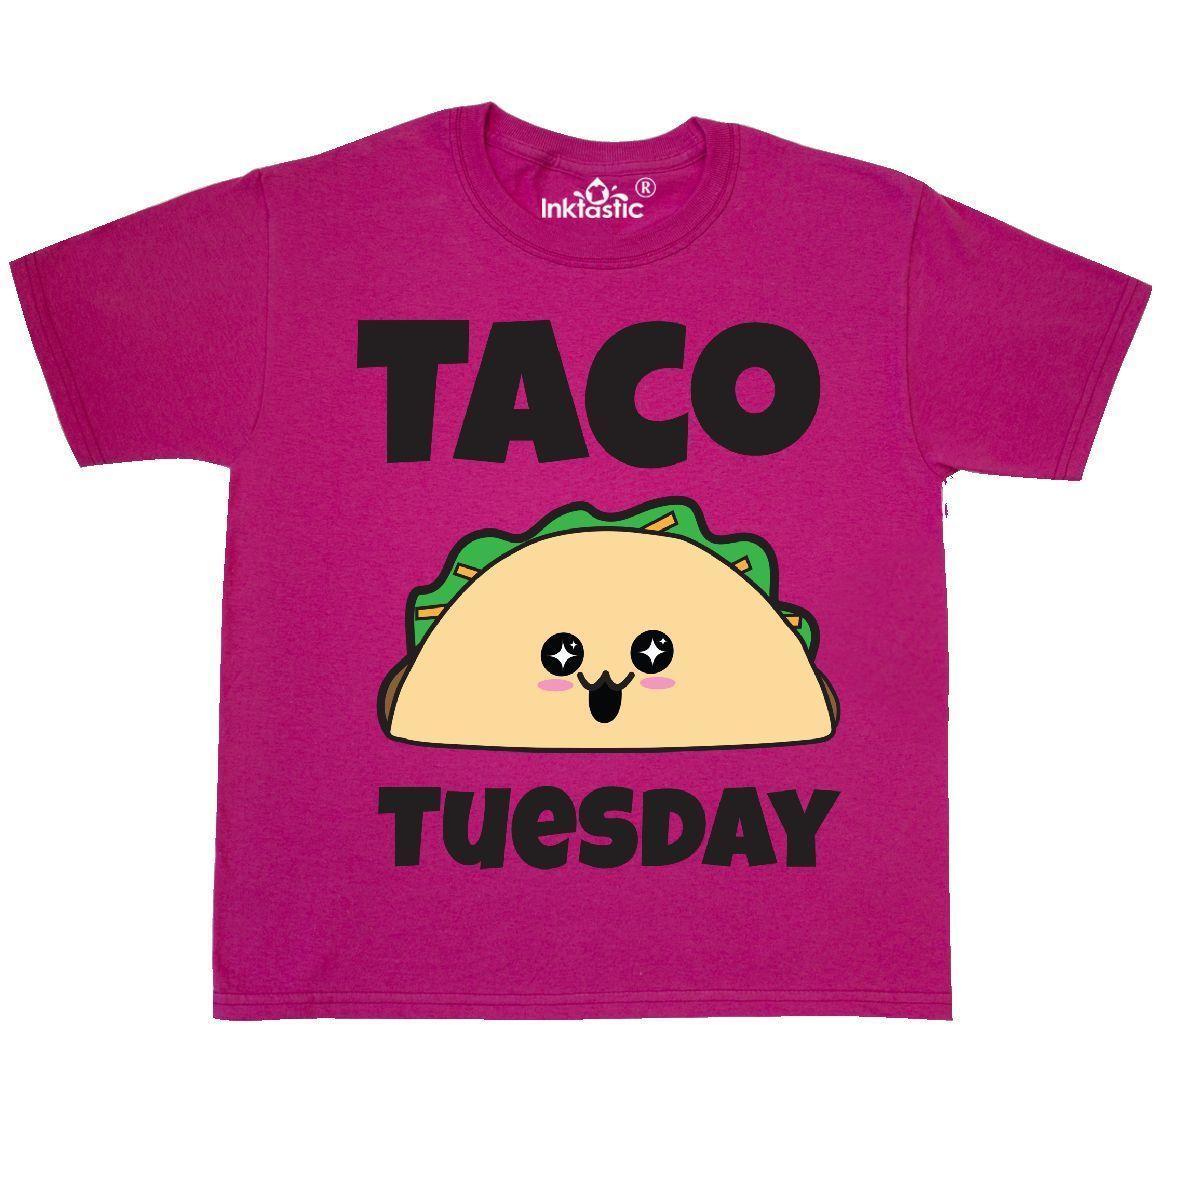 9aaea300 Inktastic Kawaii Taco Tuesday Youth T Shirt Harajuku Japanese Food Cute Tee  Kids Men Women Unisex Fashion Tshirt Graphic T Shirt Design Own T Shirt  From ...